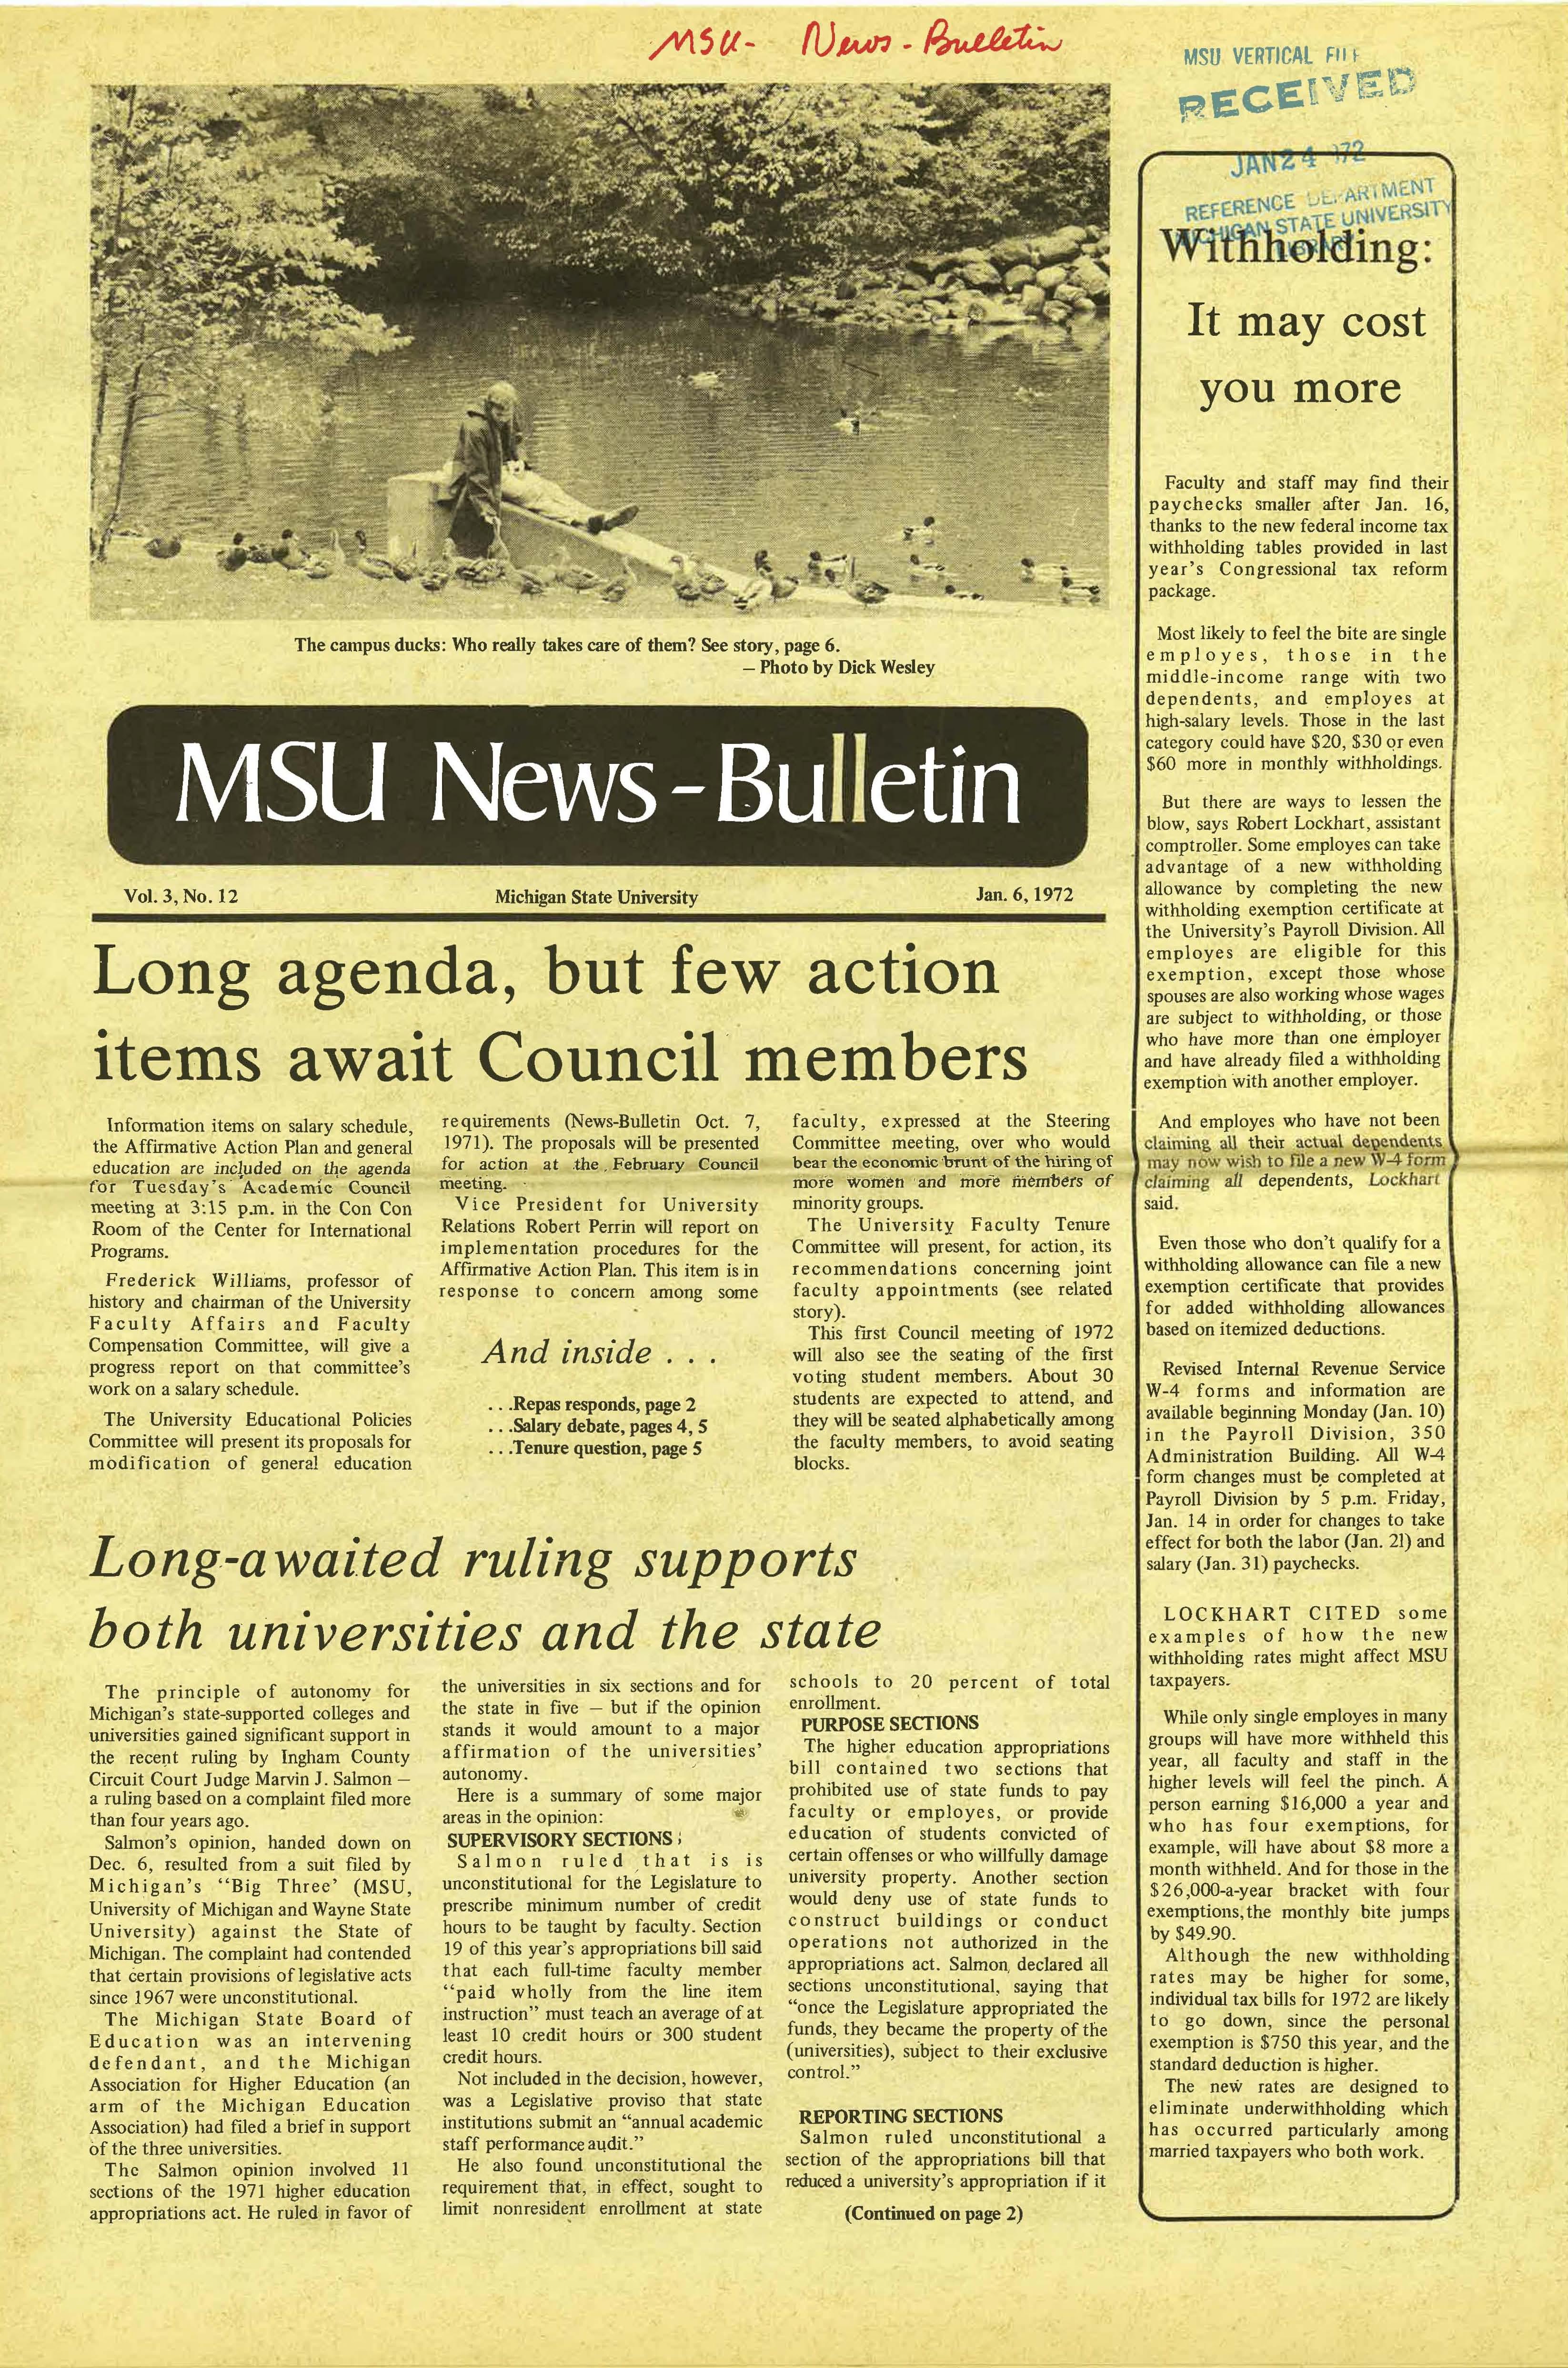 MSU News Bulletin, vol. 3, No. 35, July 27, 1972